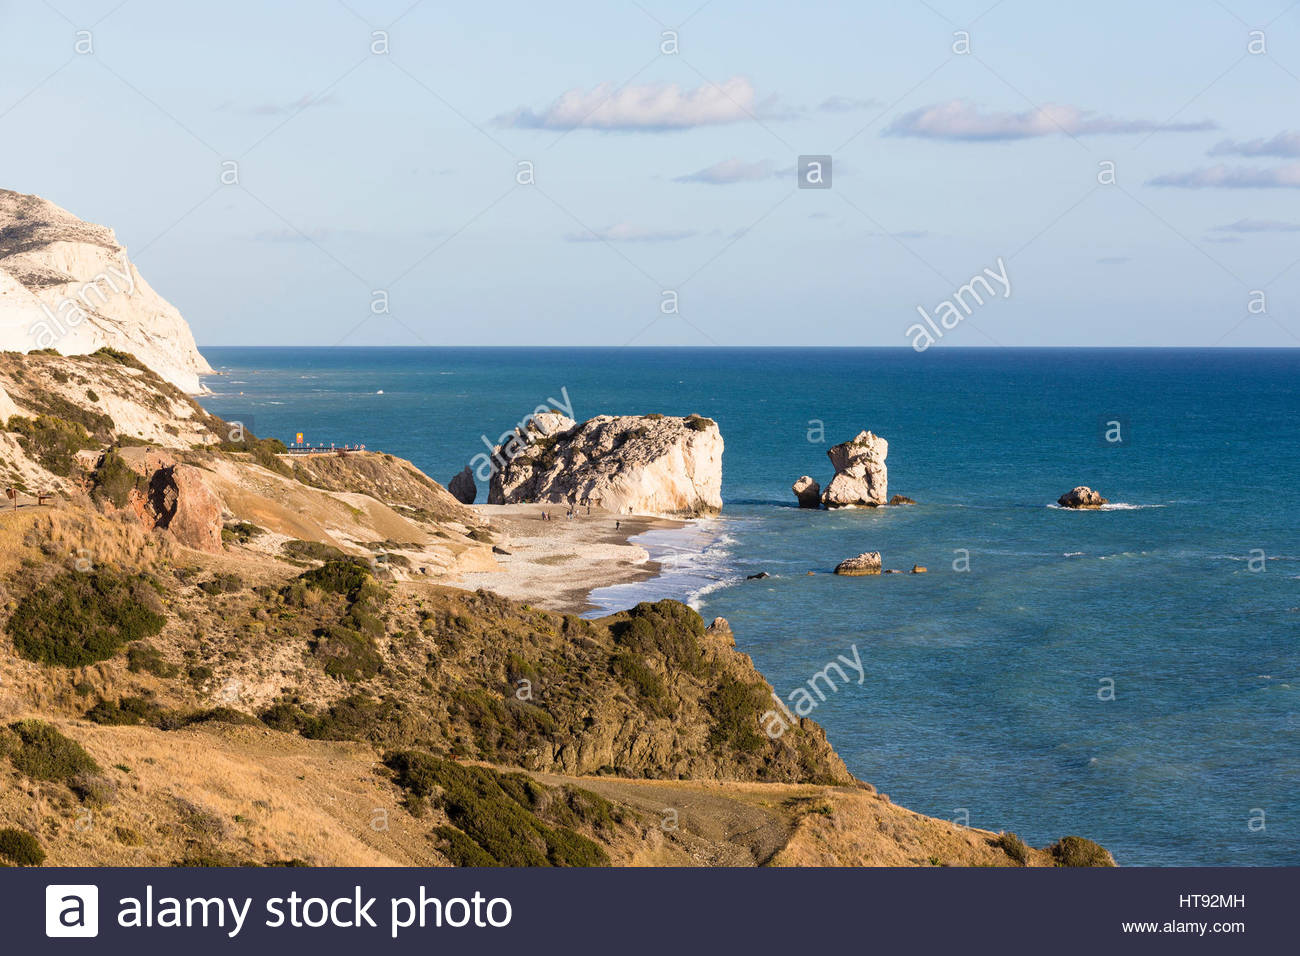 Küsten-Ansicht bei Petra Tou Romiou, Paphos, Zypern Stockbild